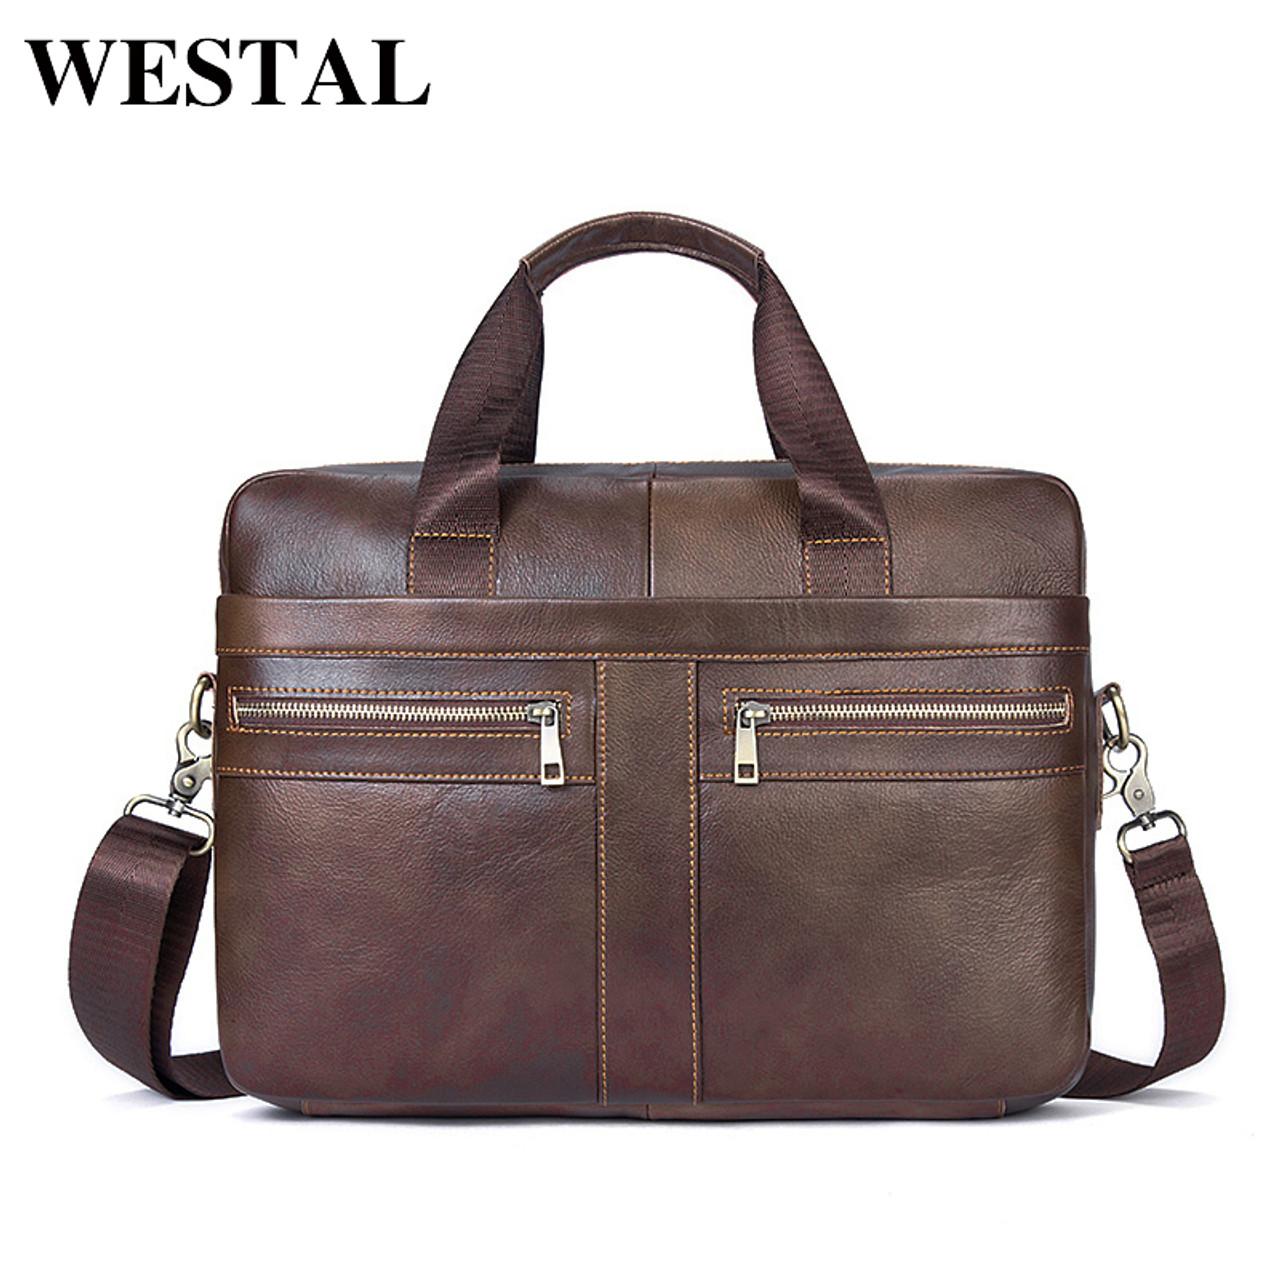 667f89ecc6 WESTAL Genuine Leather Men Bags Briefcases Men s Messenger Bag Cowhide  Leather Laptop Crossbody Handbag Male Business ...